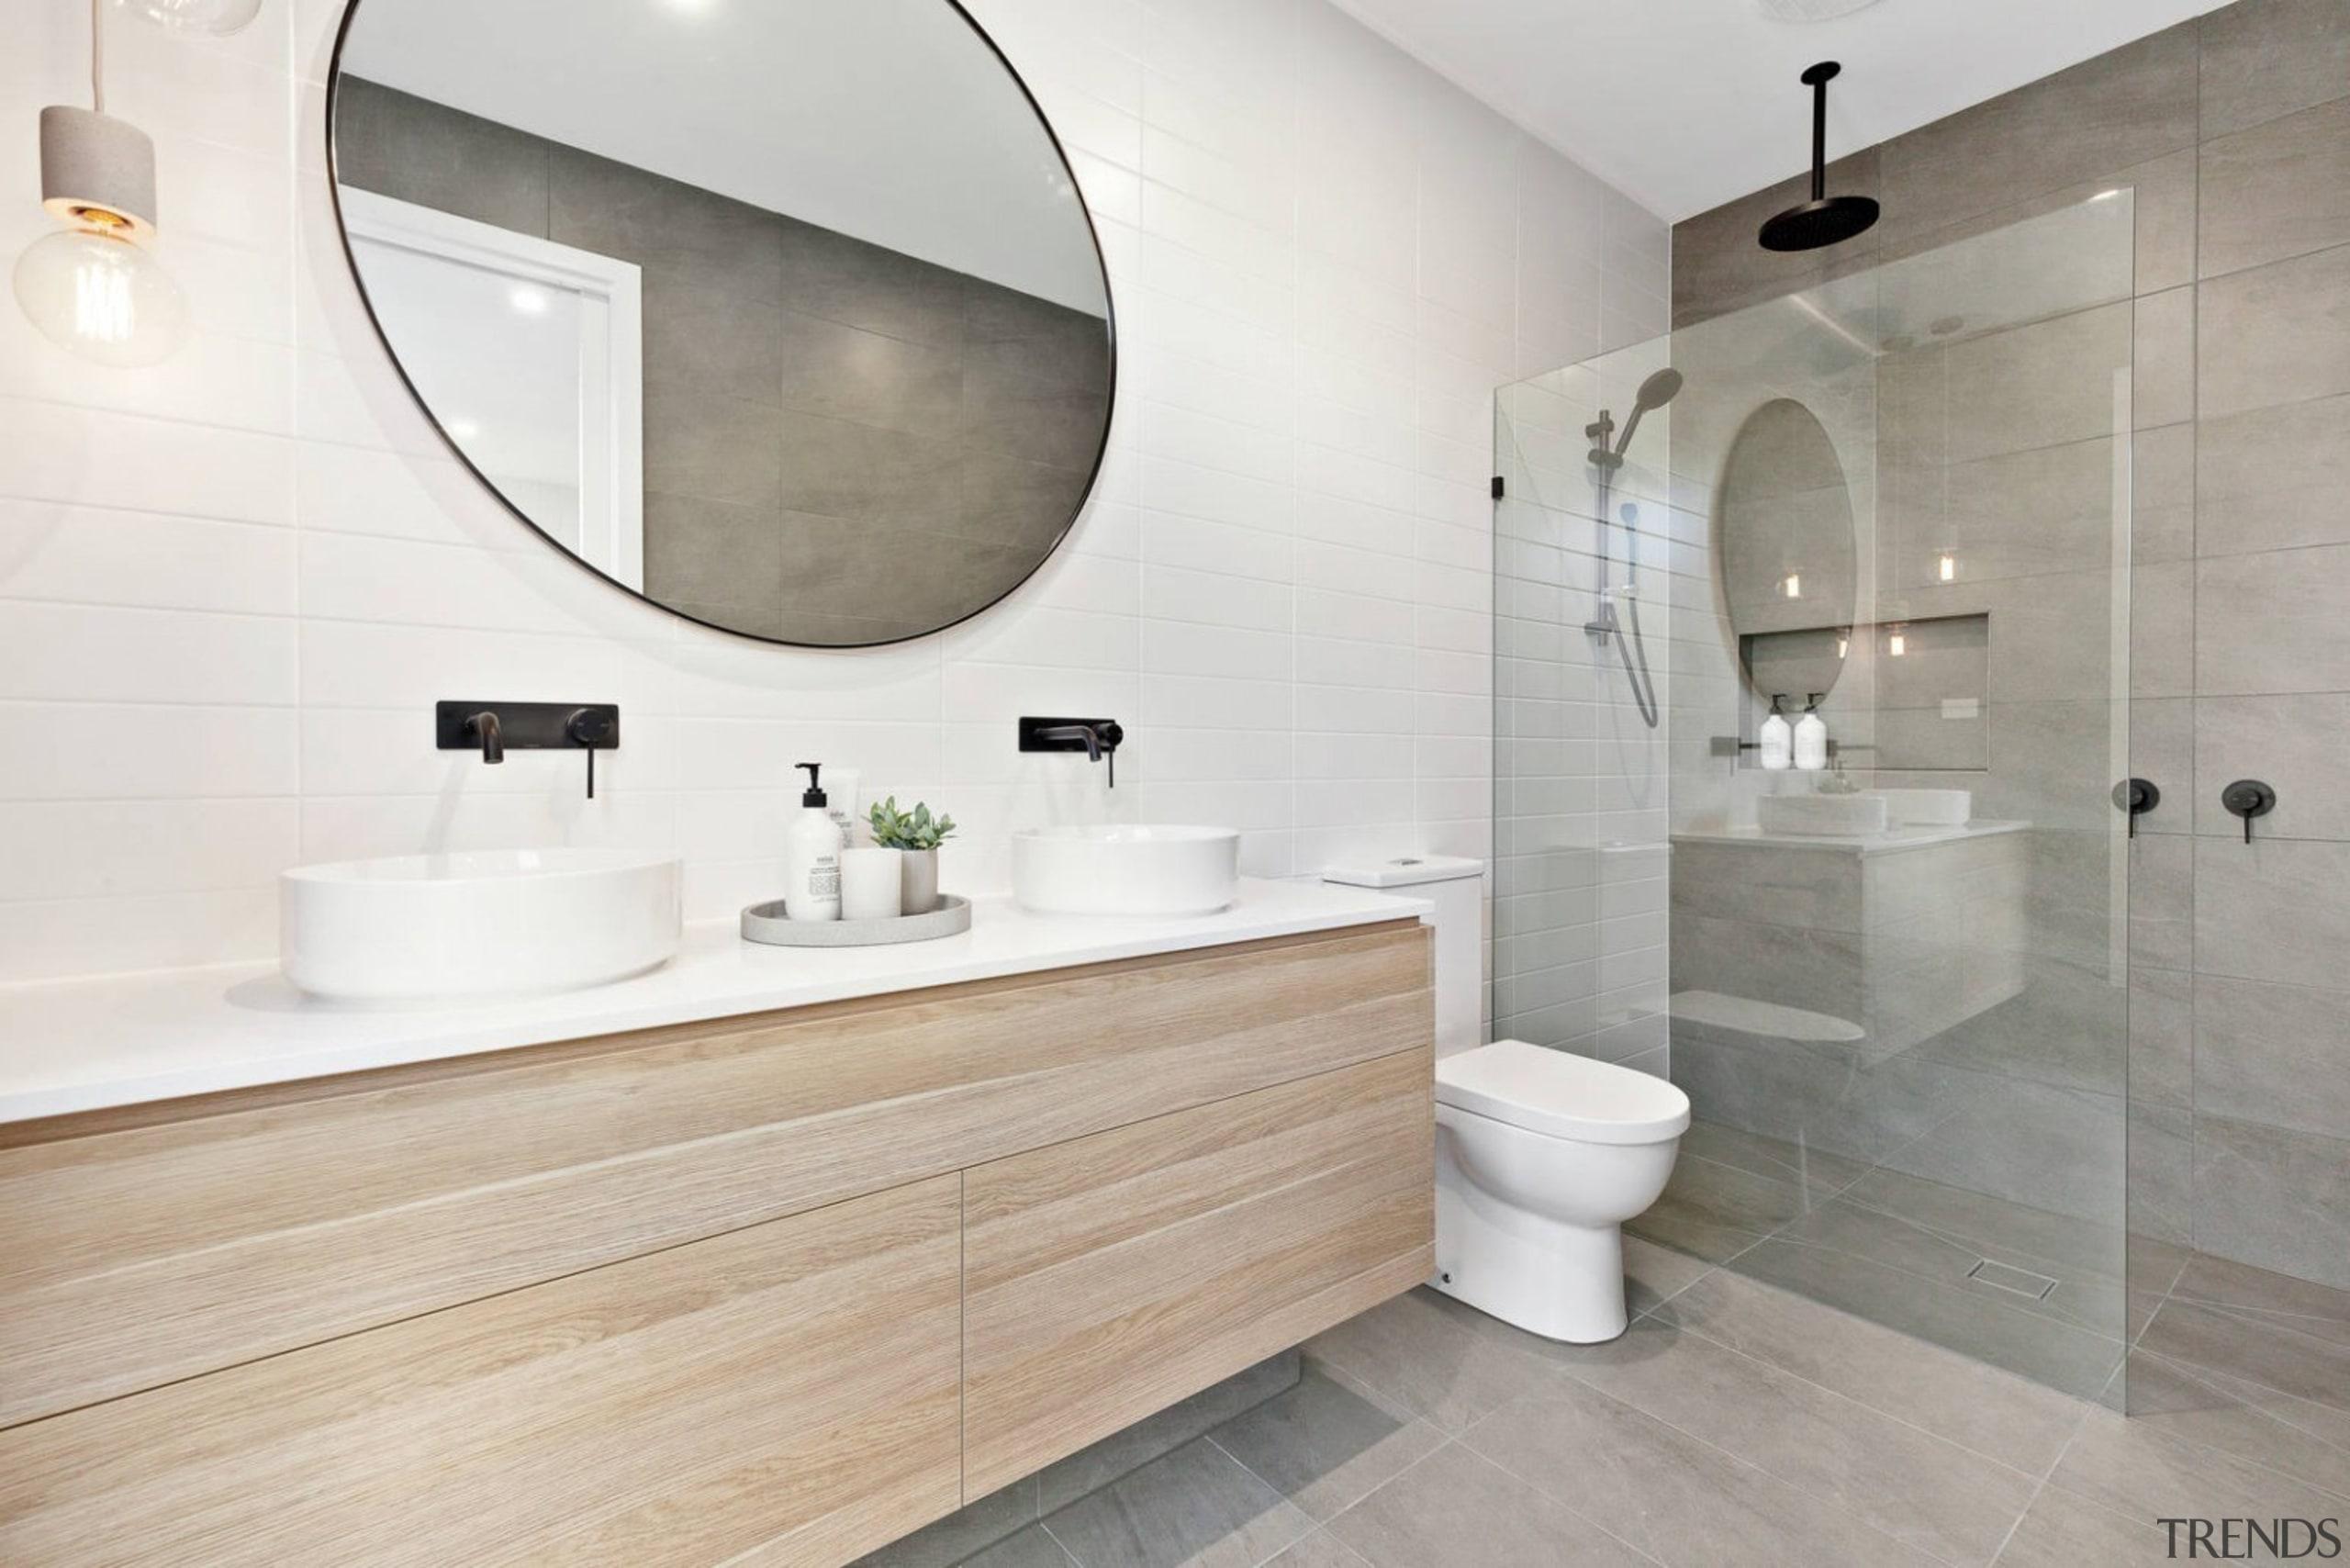 This large bathroom features a rain shower head bathroom, floor, flooring, interior design, product design, room, sink, tap, tile, gray